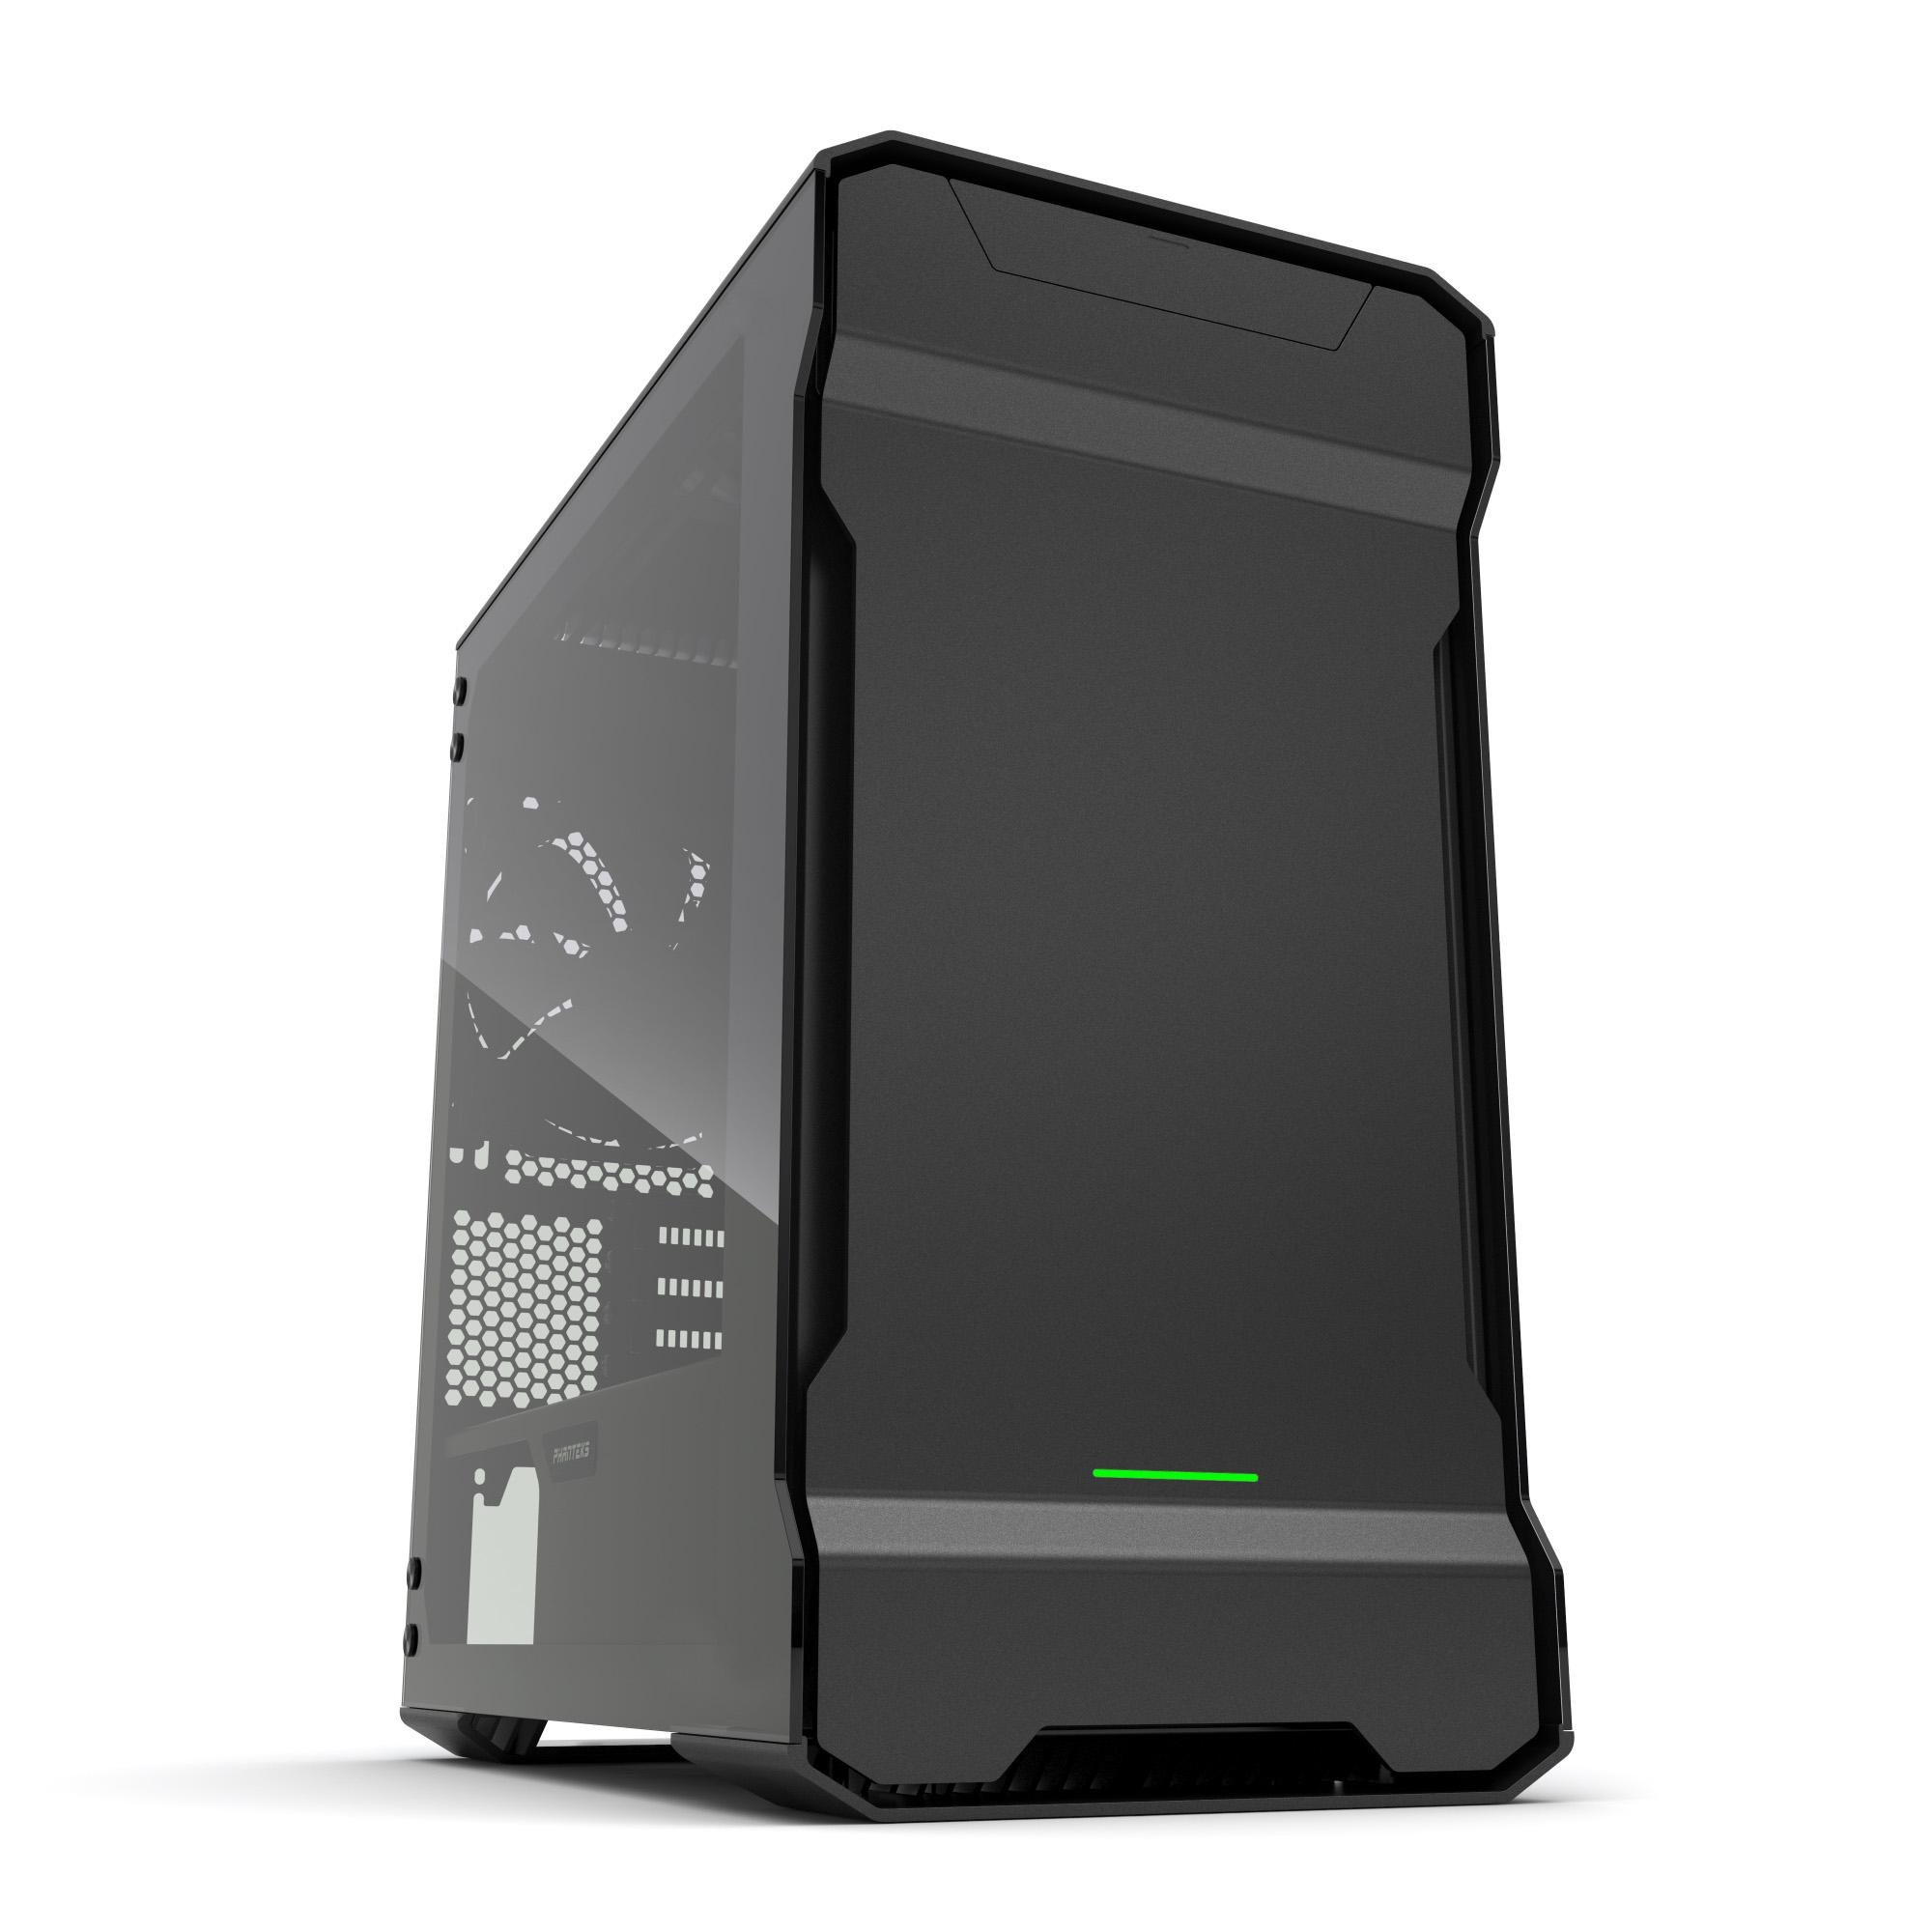 Phanteks Enthoo Evolv mATX Micro-Tower Black computer case